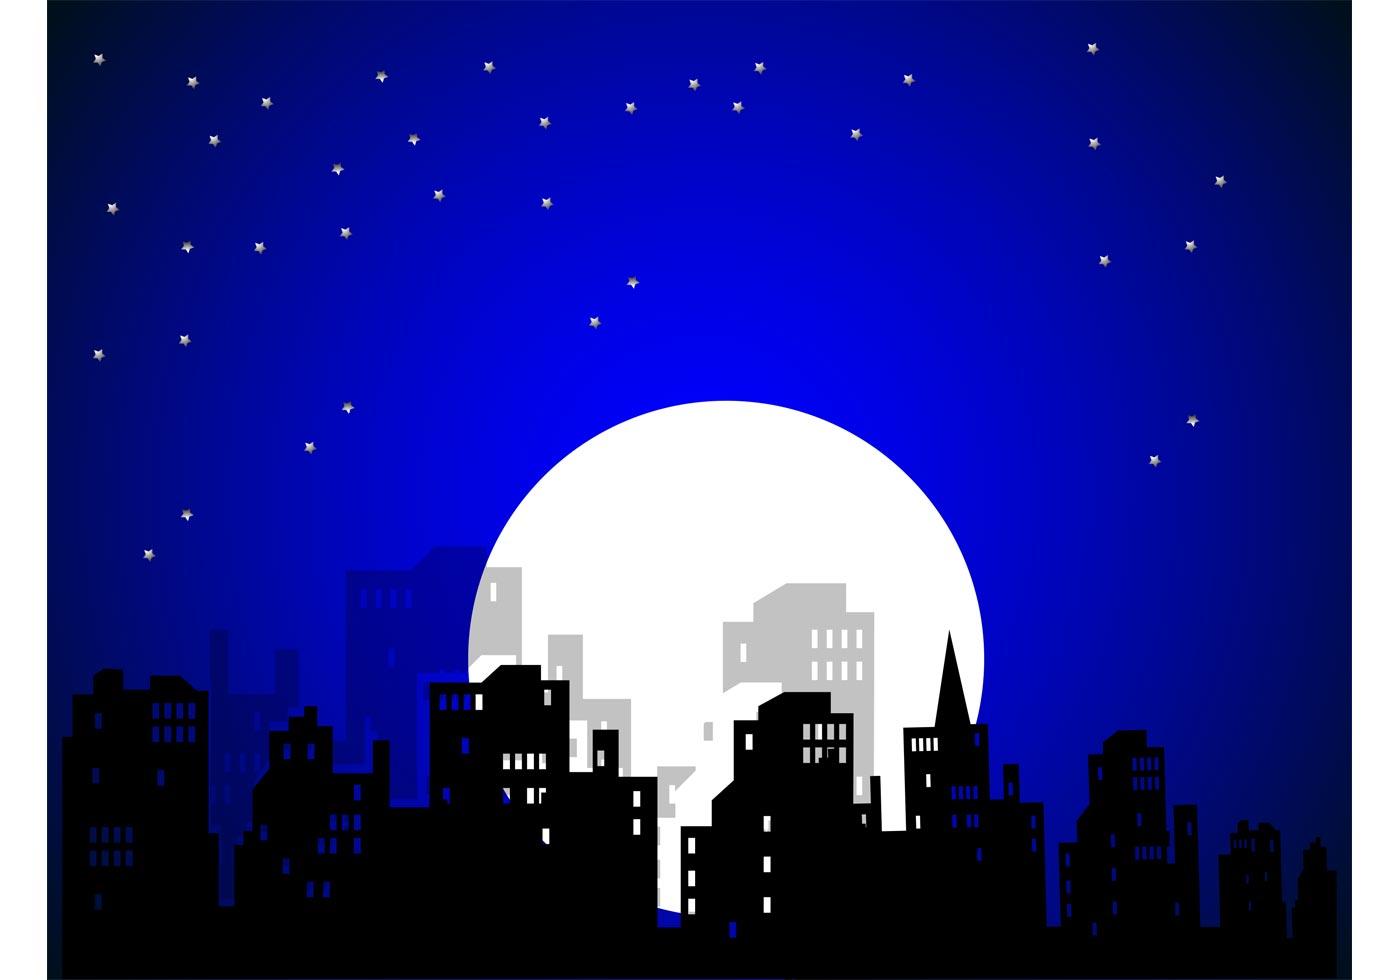 cartoon night vector wallpaper - photo #11